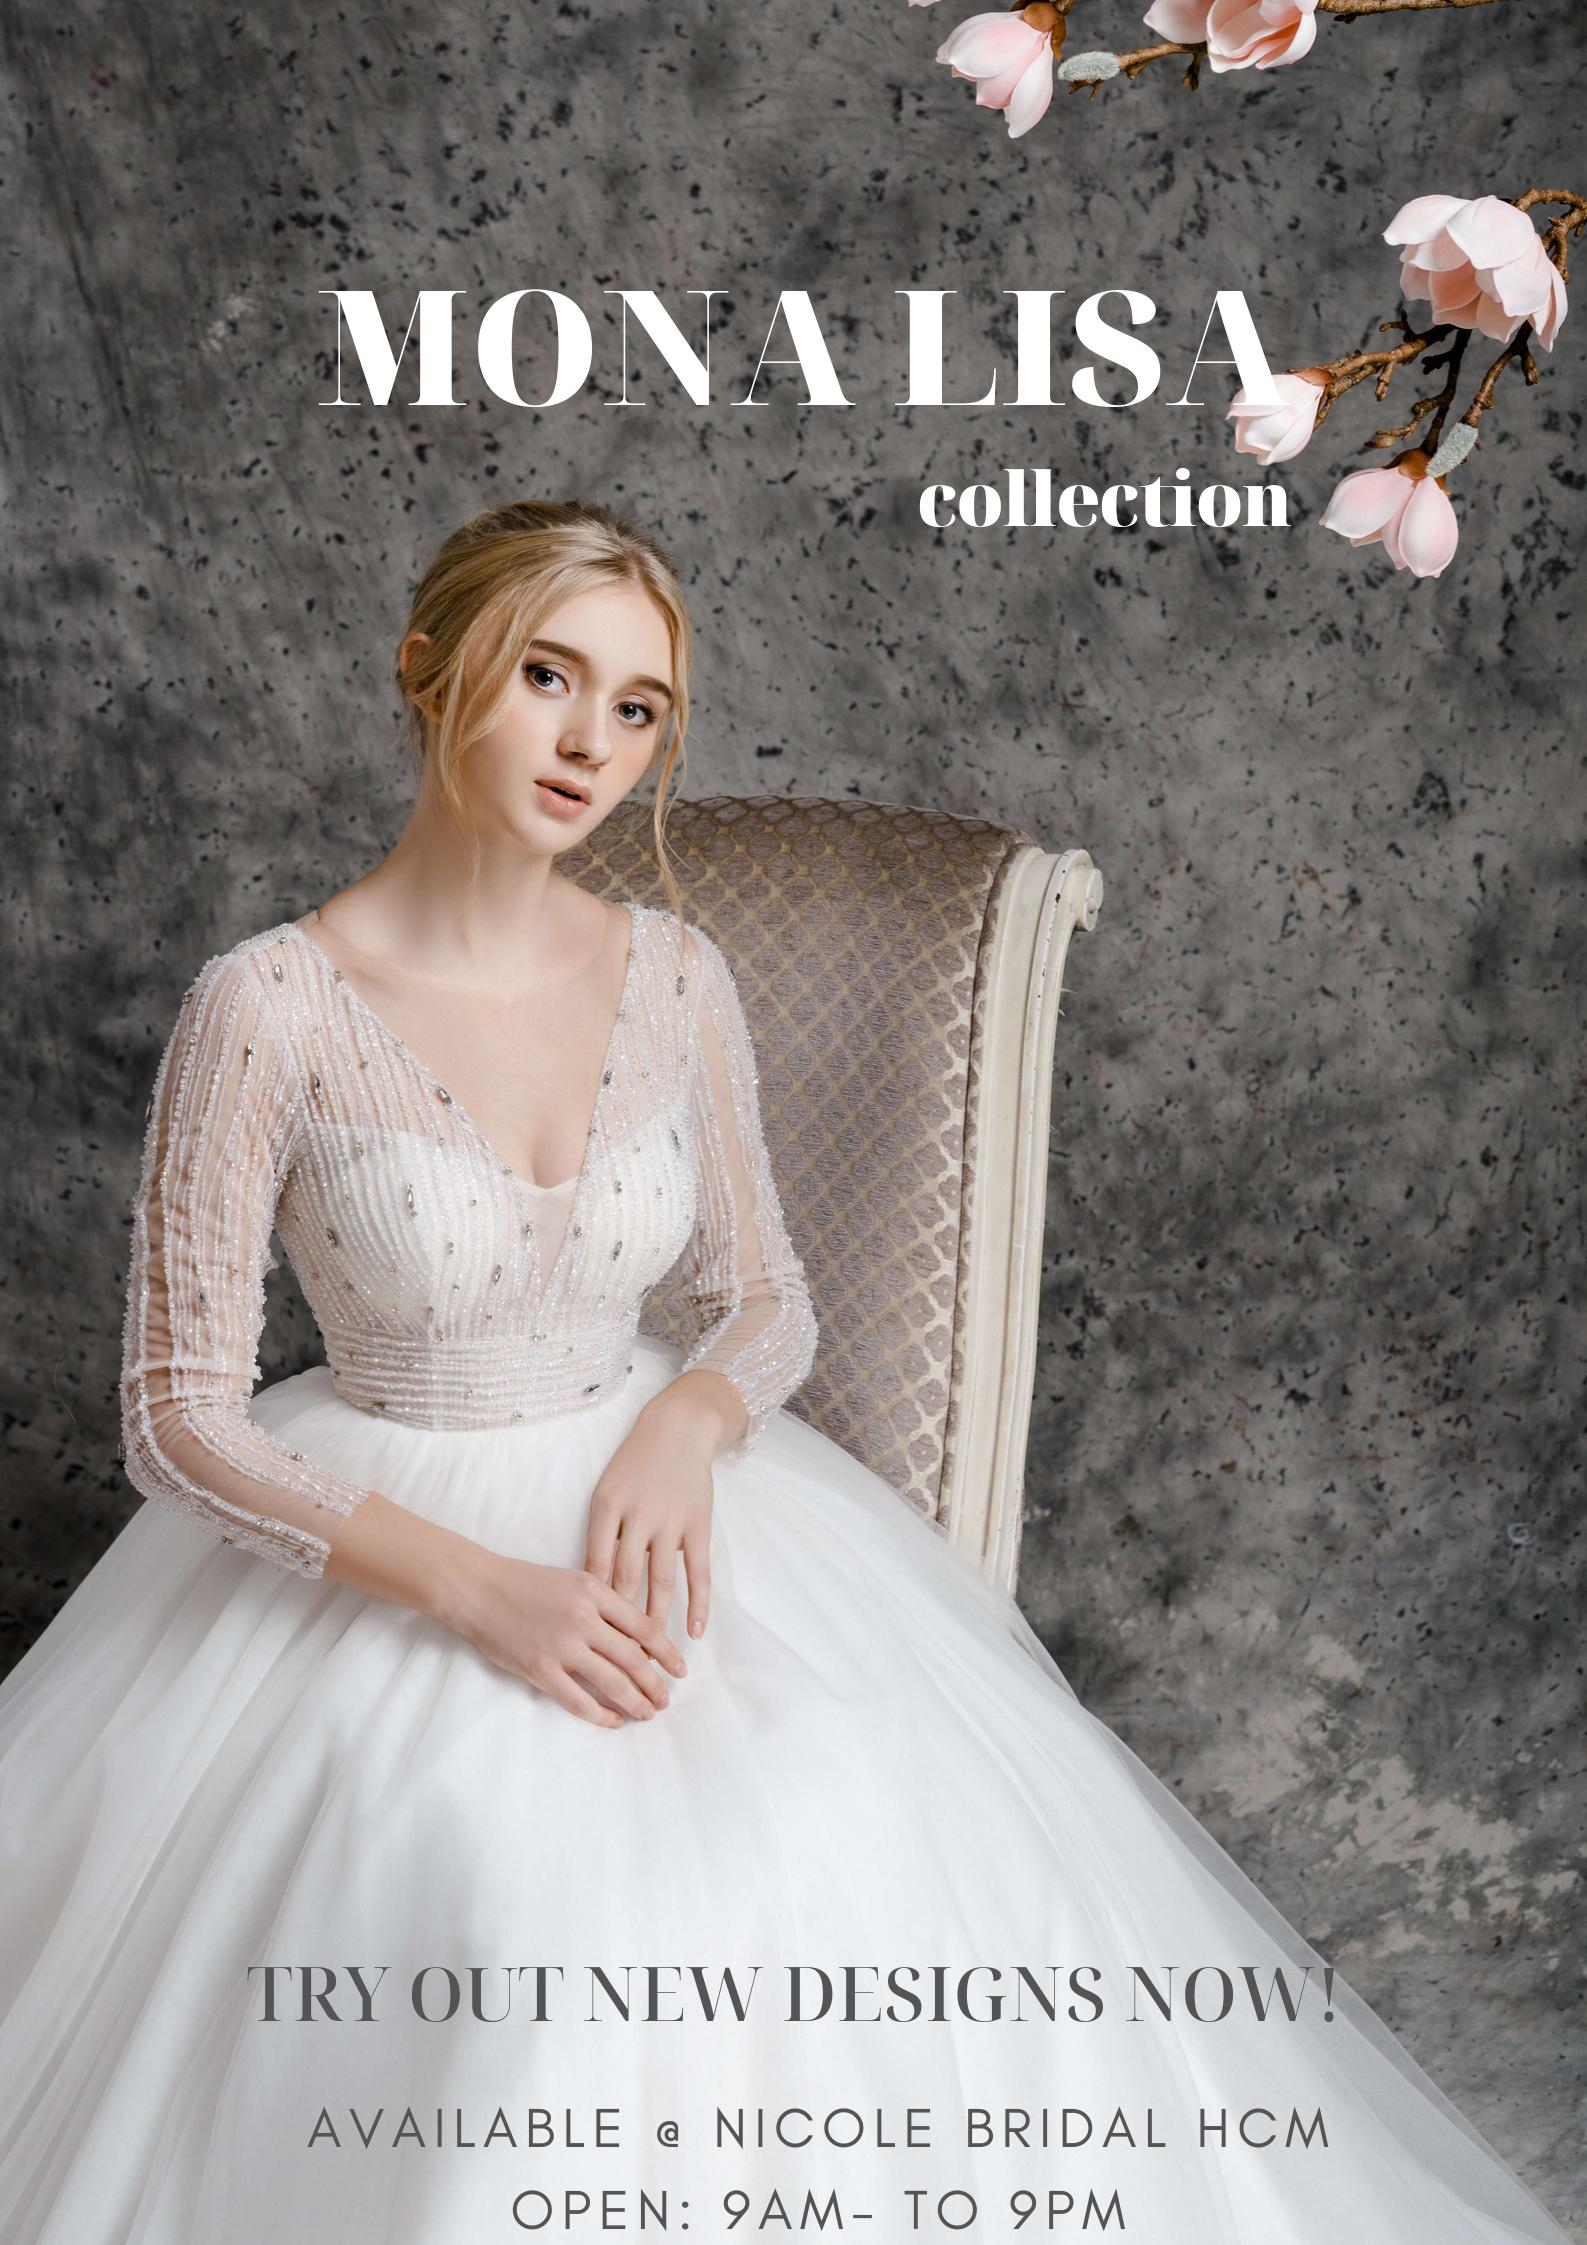 BST MONA LISA by Nicole Bridal cho mùa cưới 2019